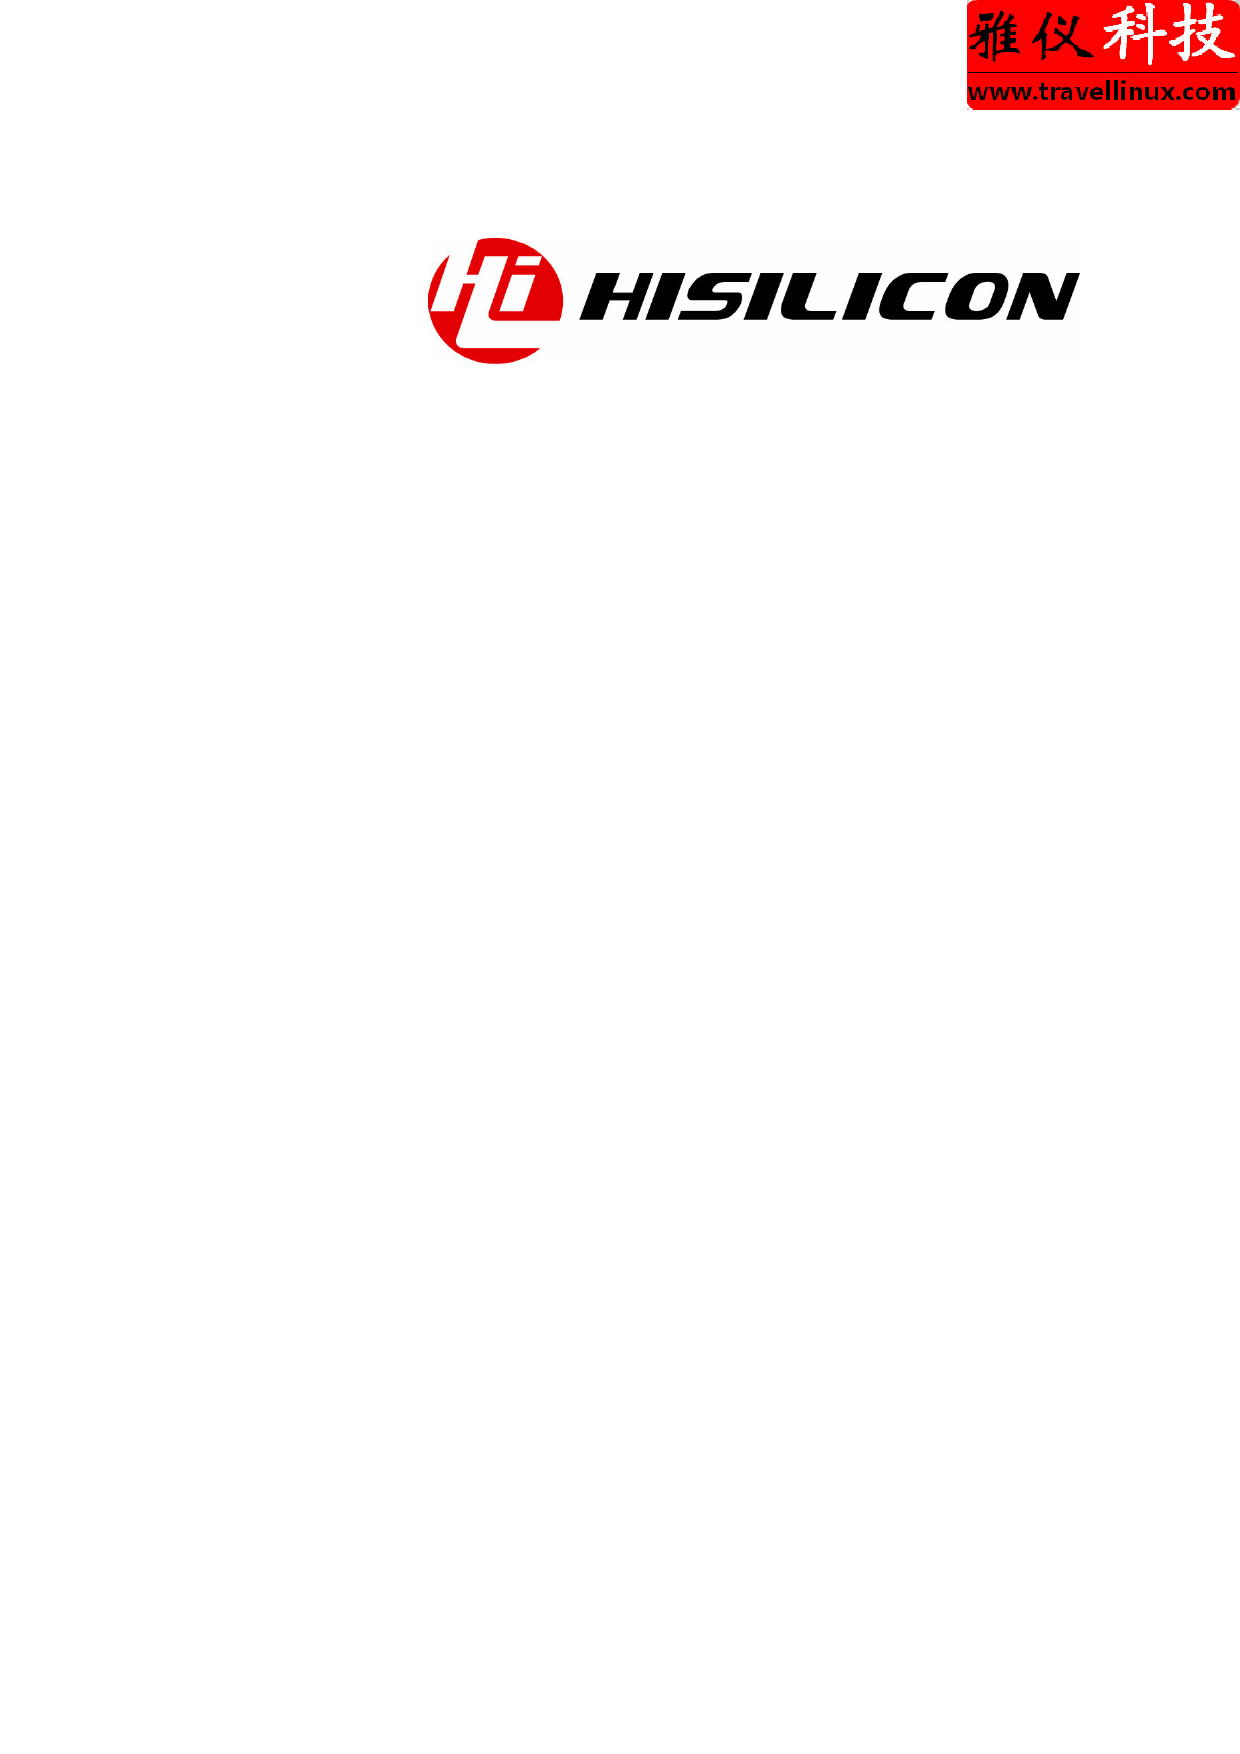 Hi3531